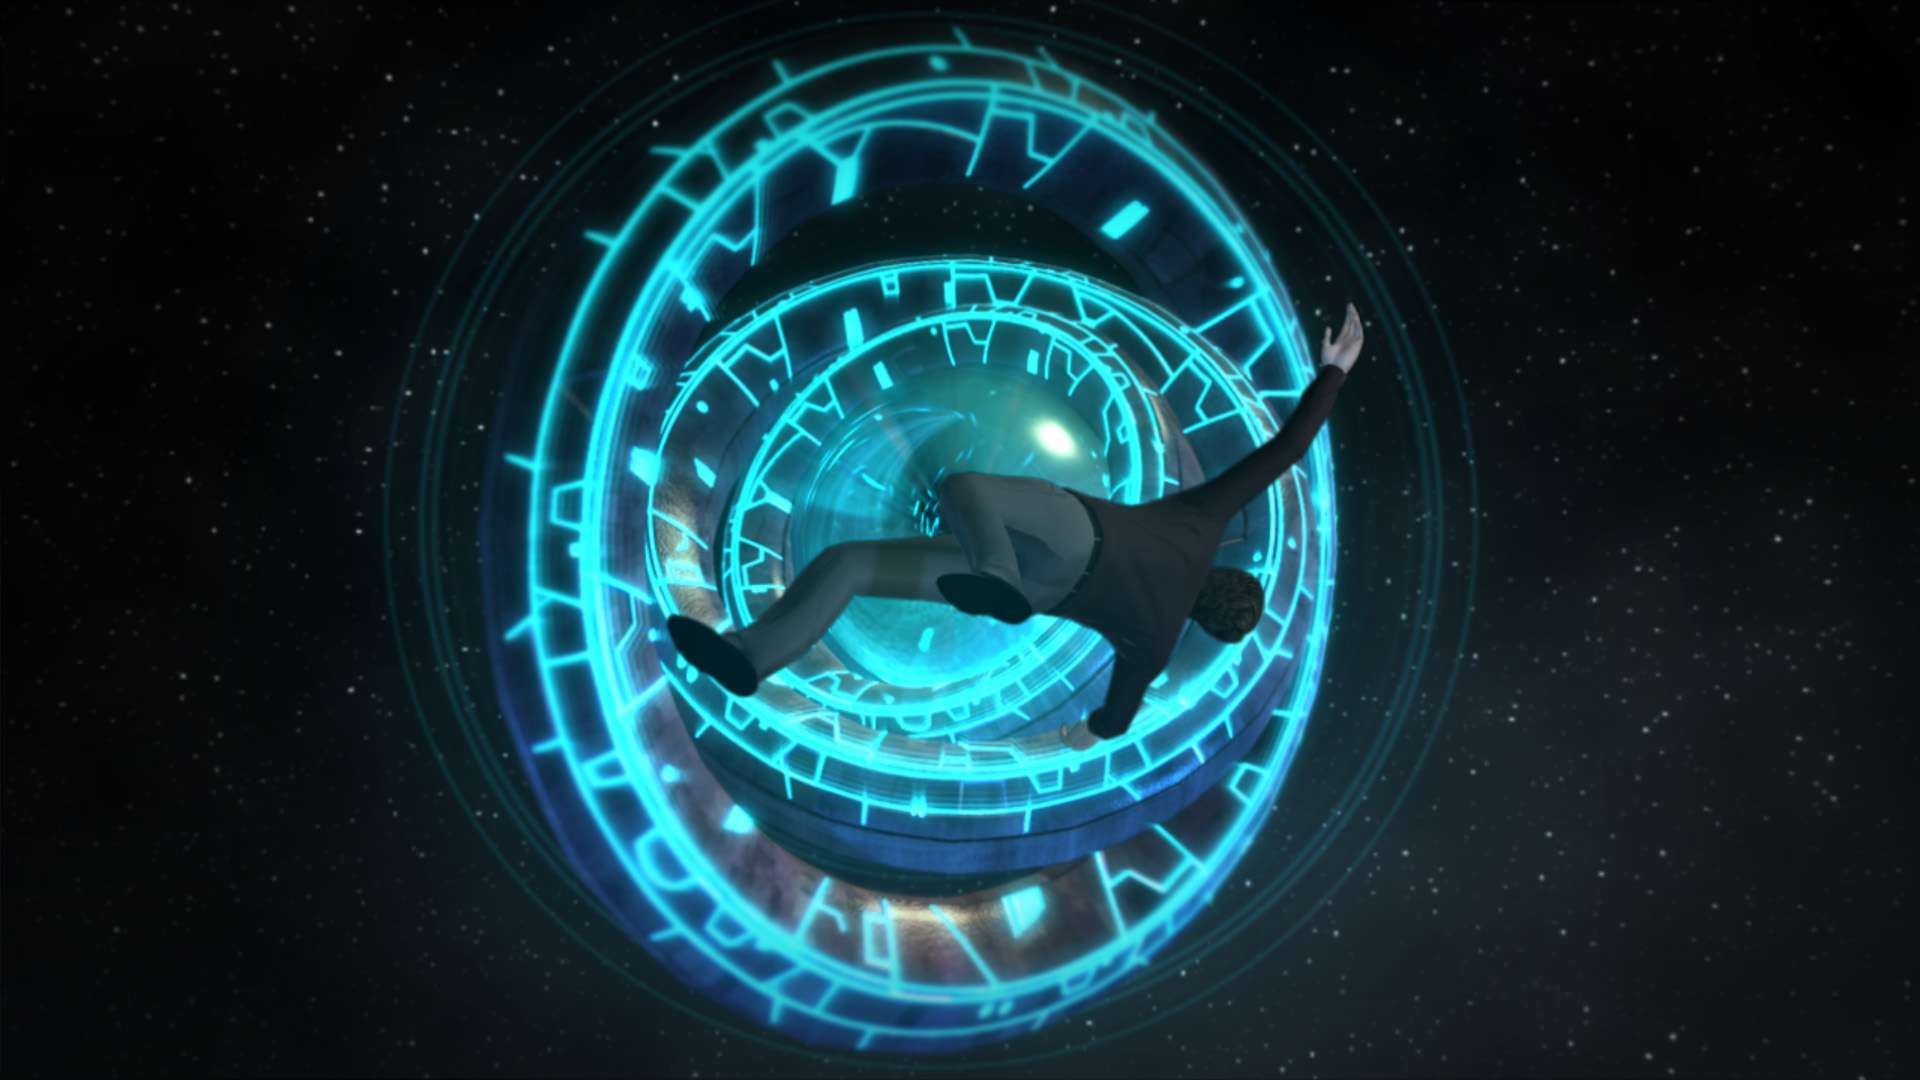 Moebius floats in space in Jane Jensen's Moebius: Empire Rising